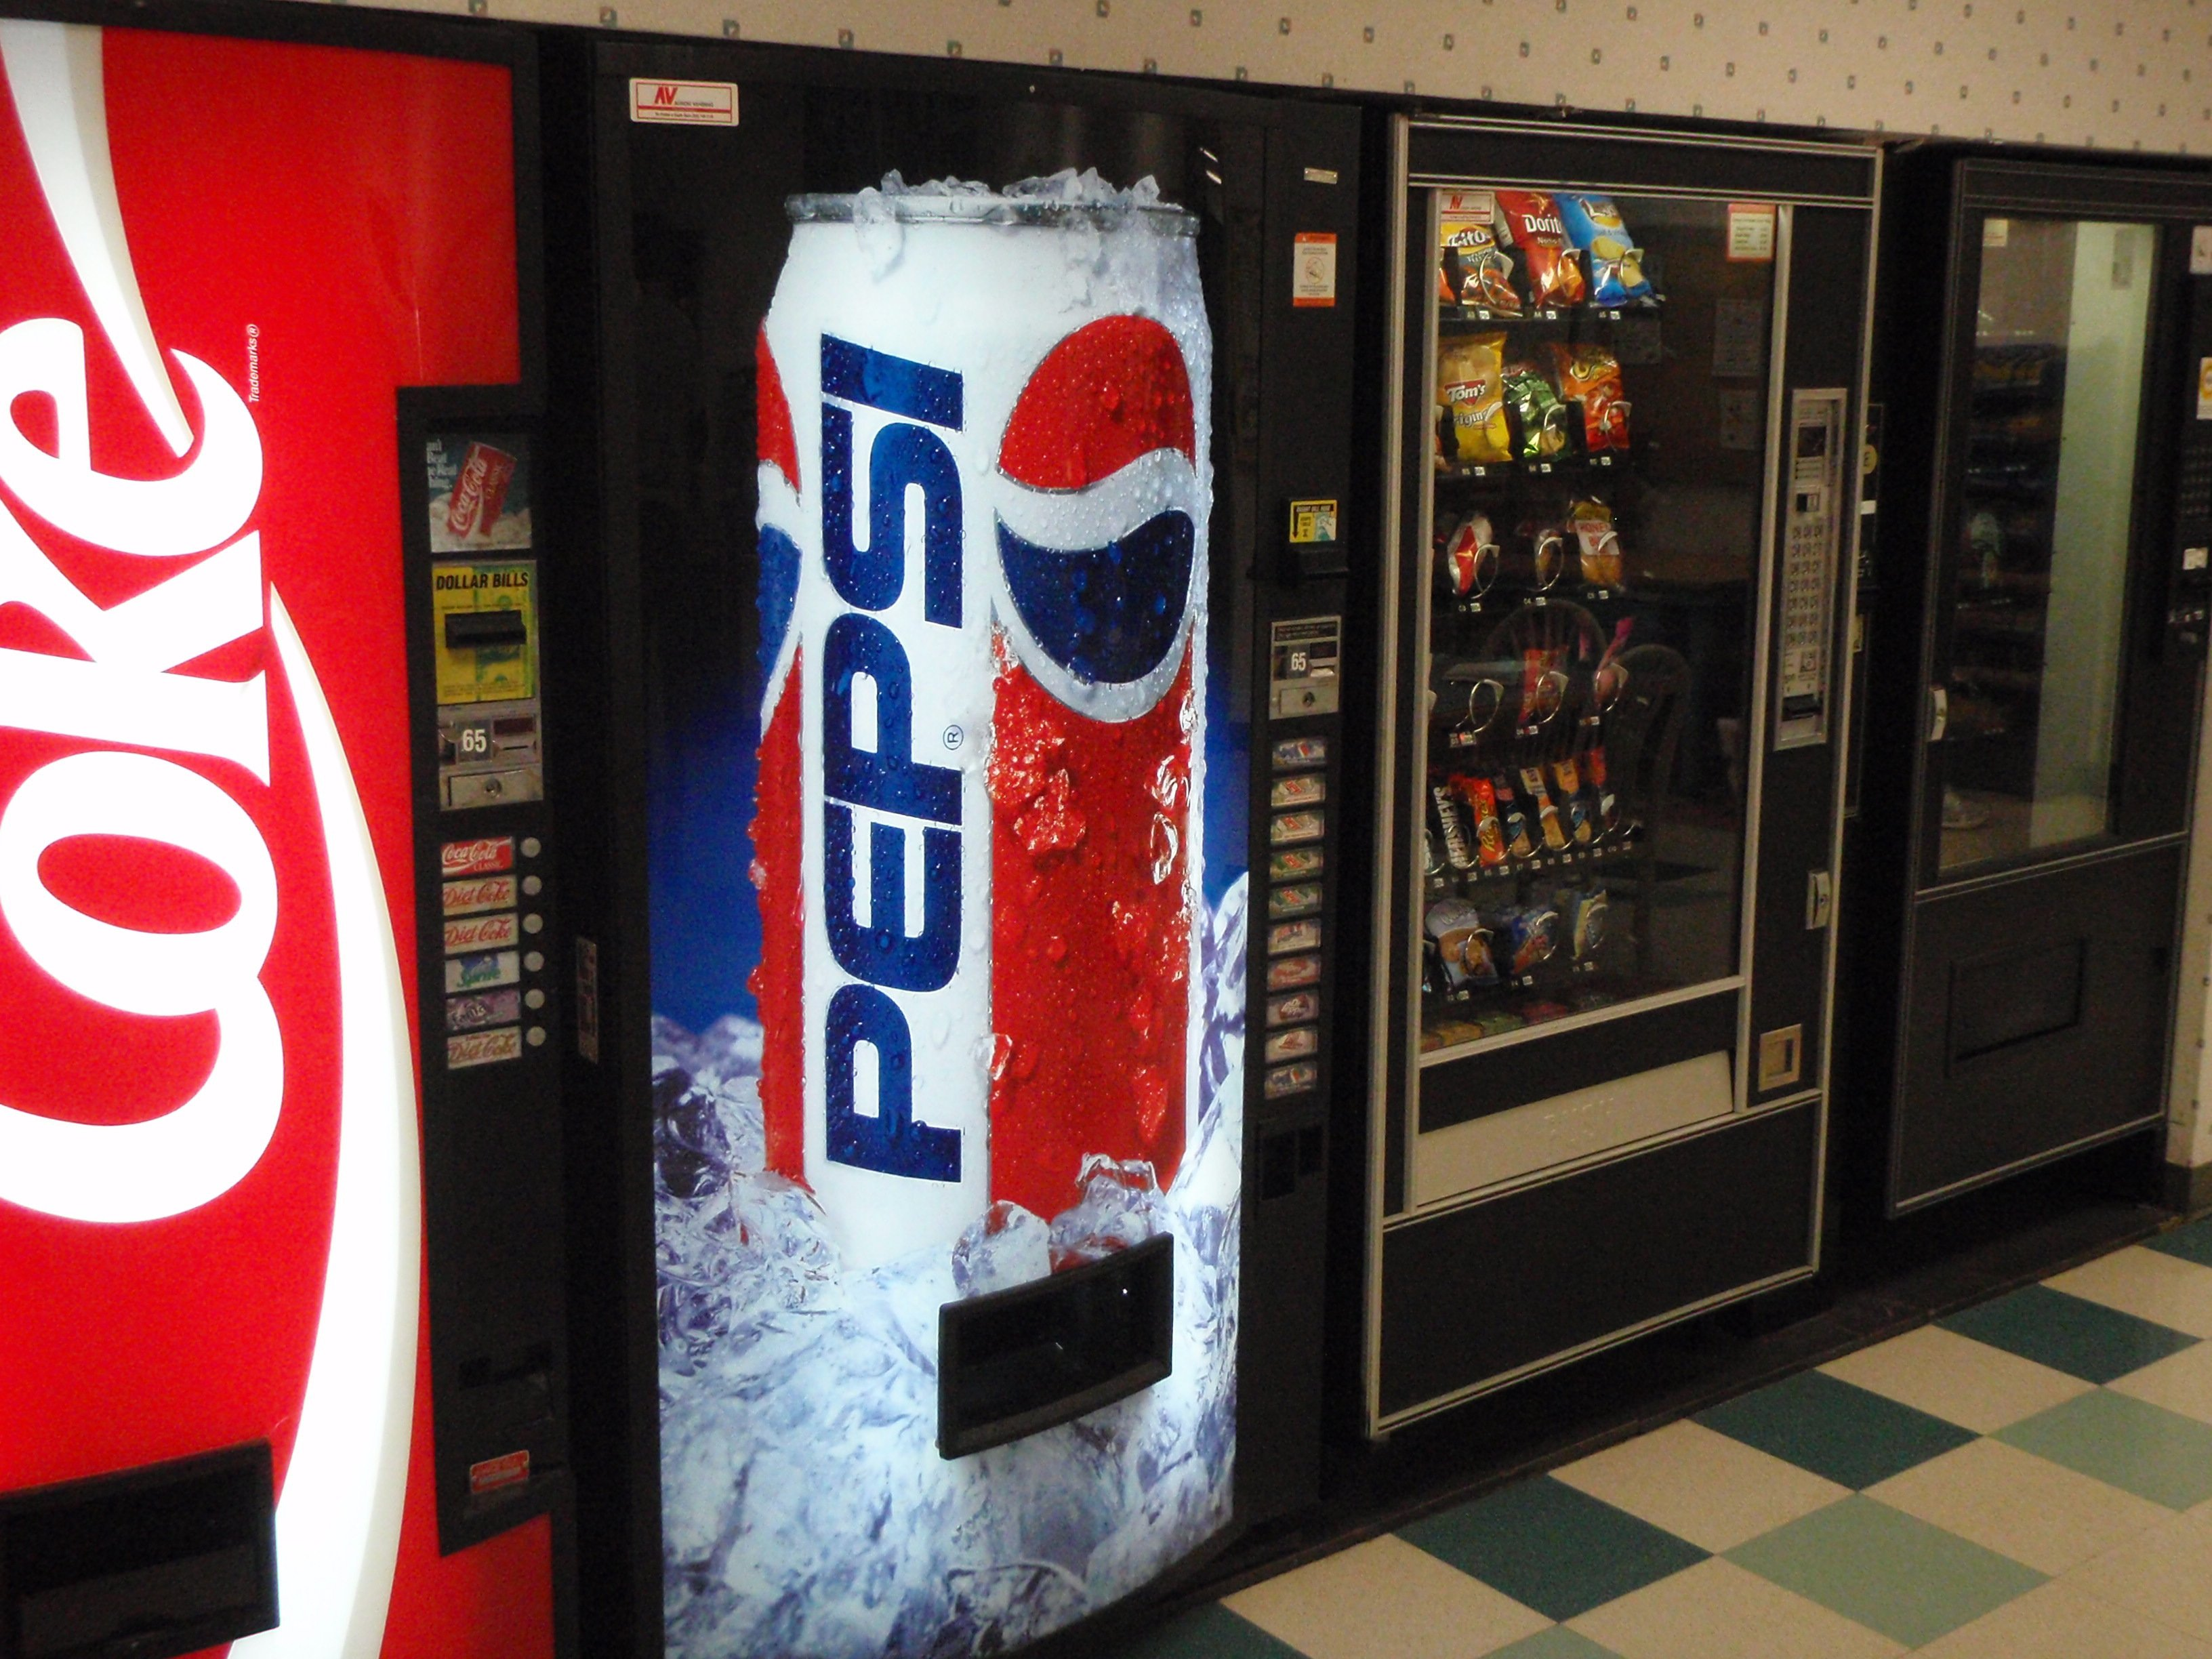 Coke & Pepsi Beverage Vending Machines, Winston-Salem NC